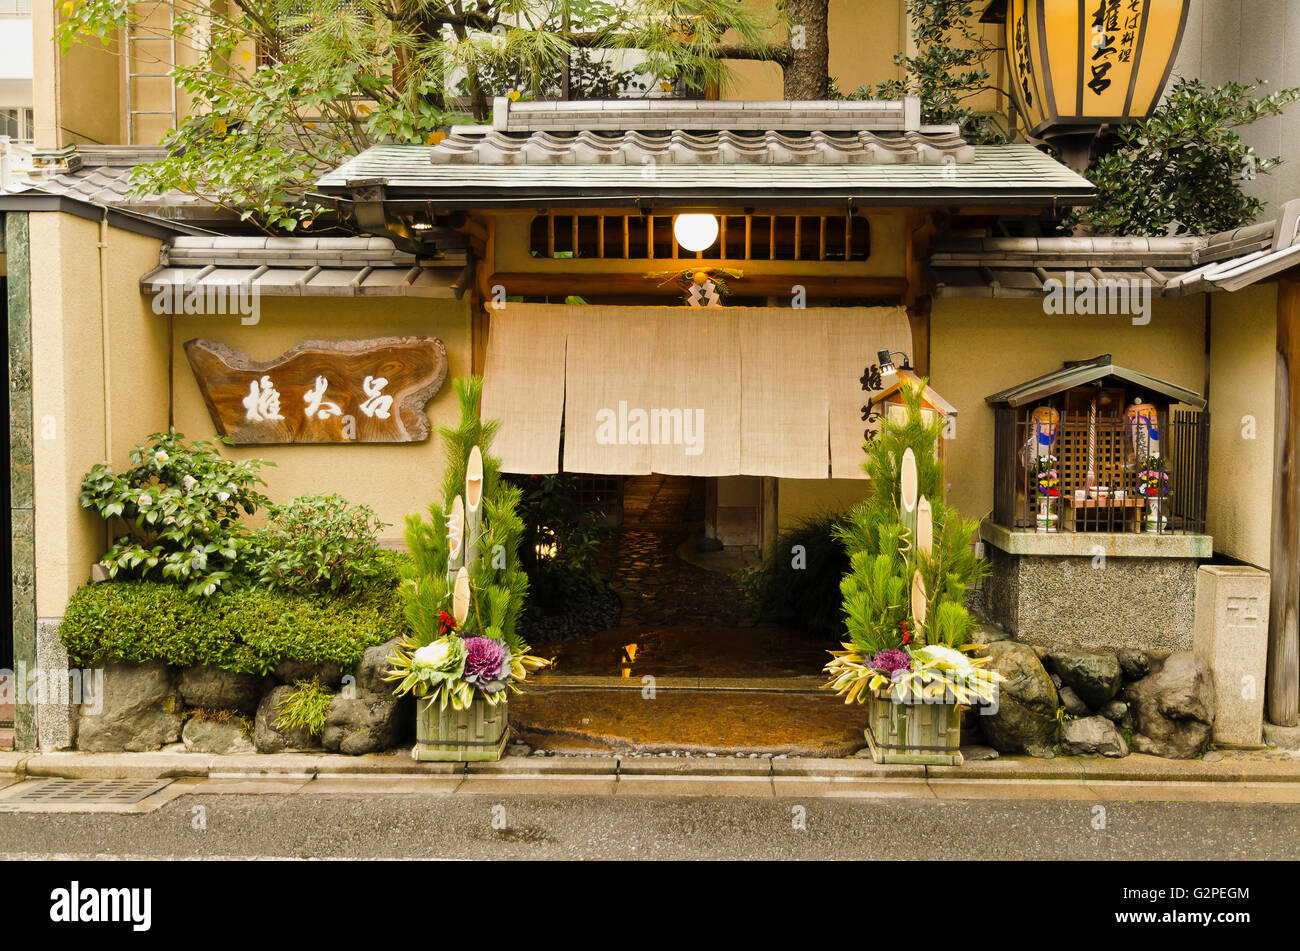 Japan Kyoto Traditional Restaurant Near Nishiki Market Entrance